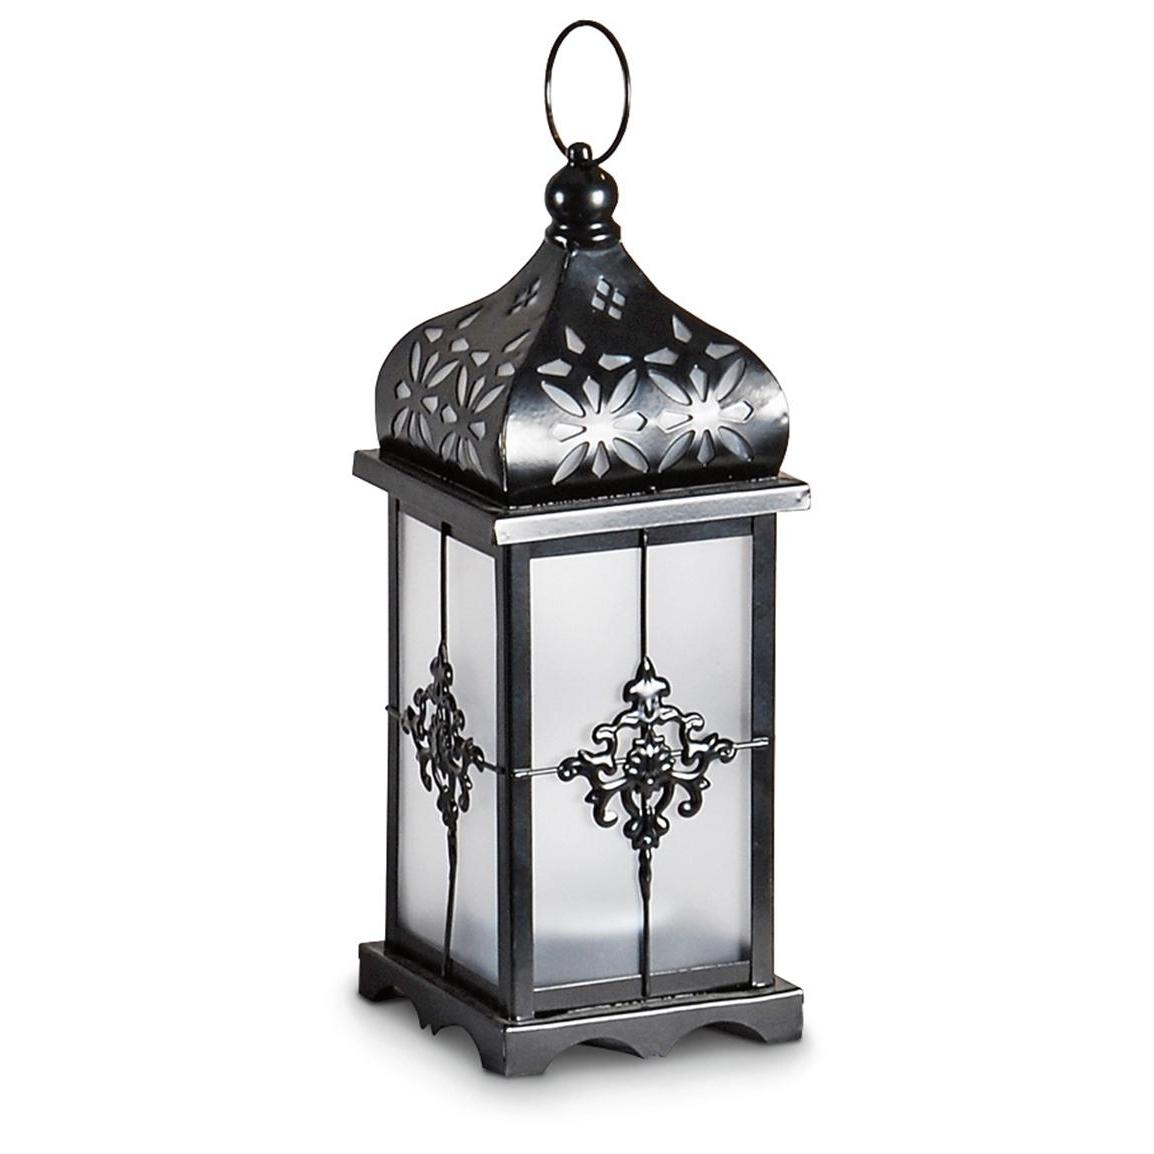 Outdoor Decorative Lanterns For Popular 2 Filigree Solar Lanterns – 232102, Solar & Outdoor Lighting At (View 10 of 20)